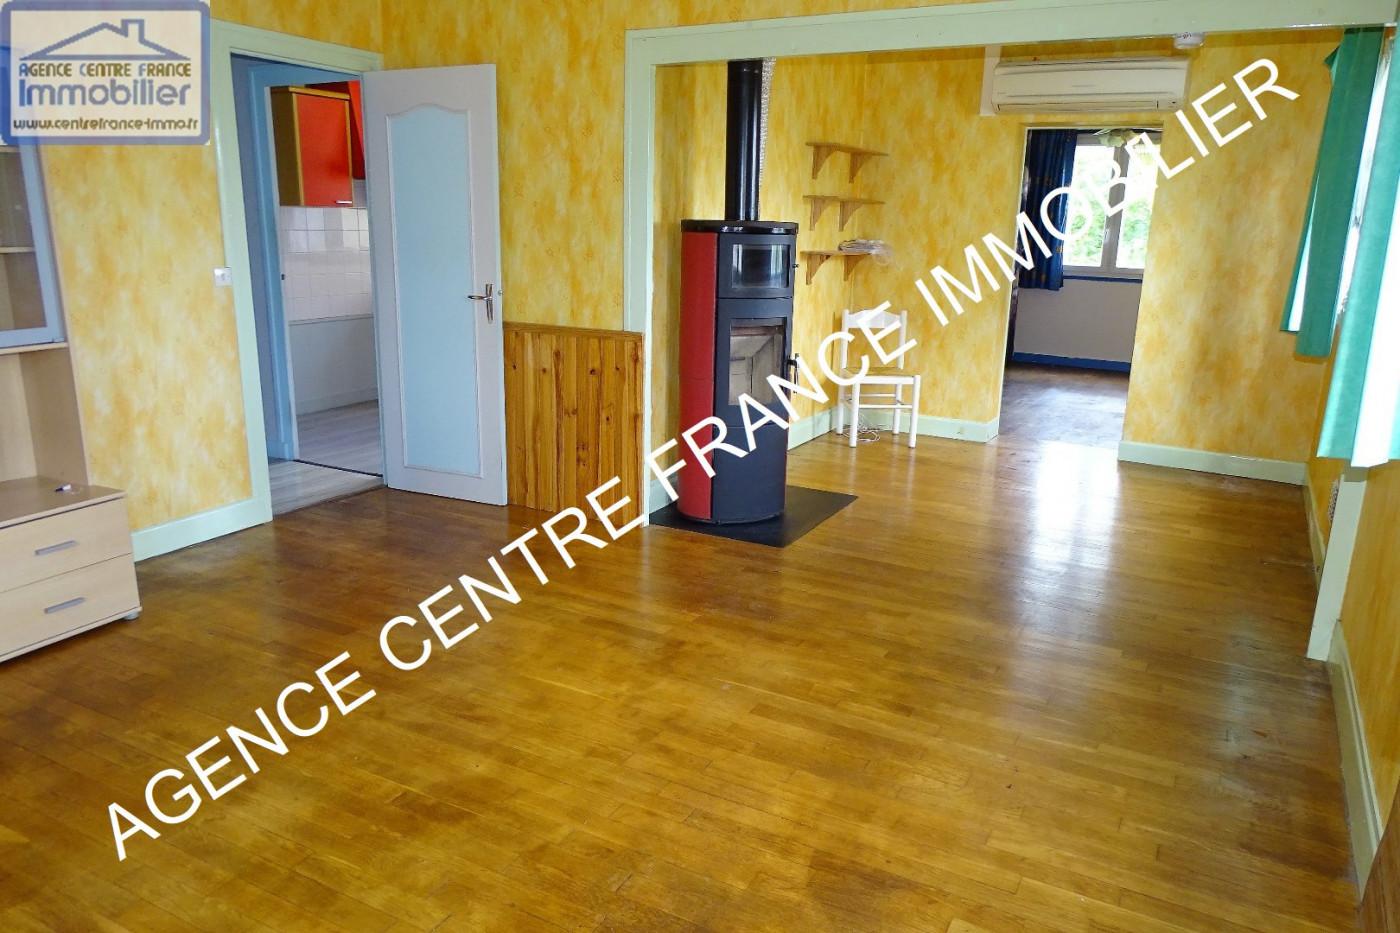 A vendre  Bourges   Réf 03001926 - Agence centre france immobilier